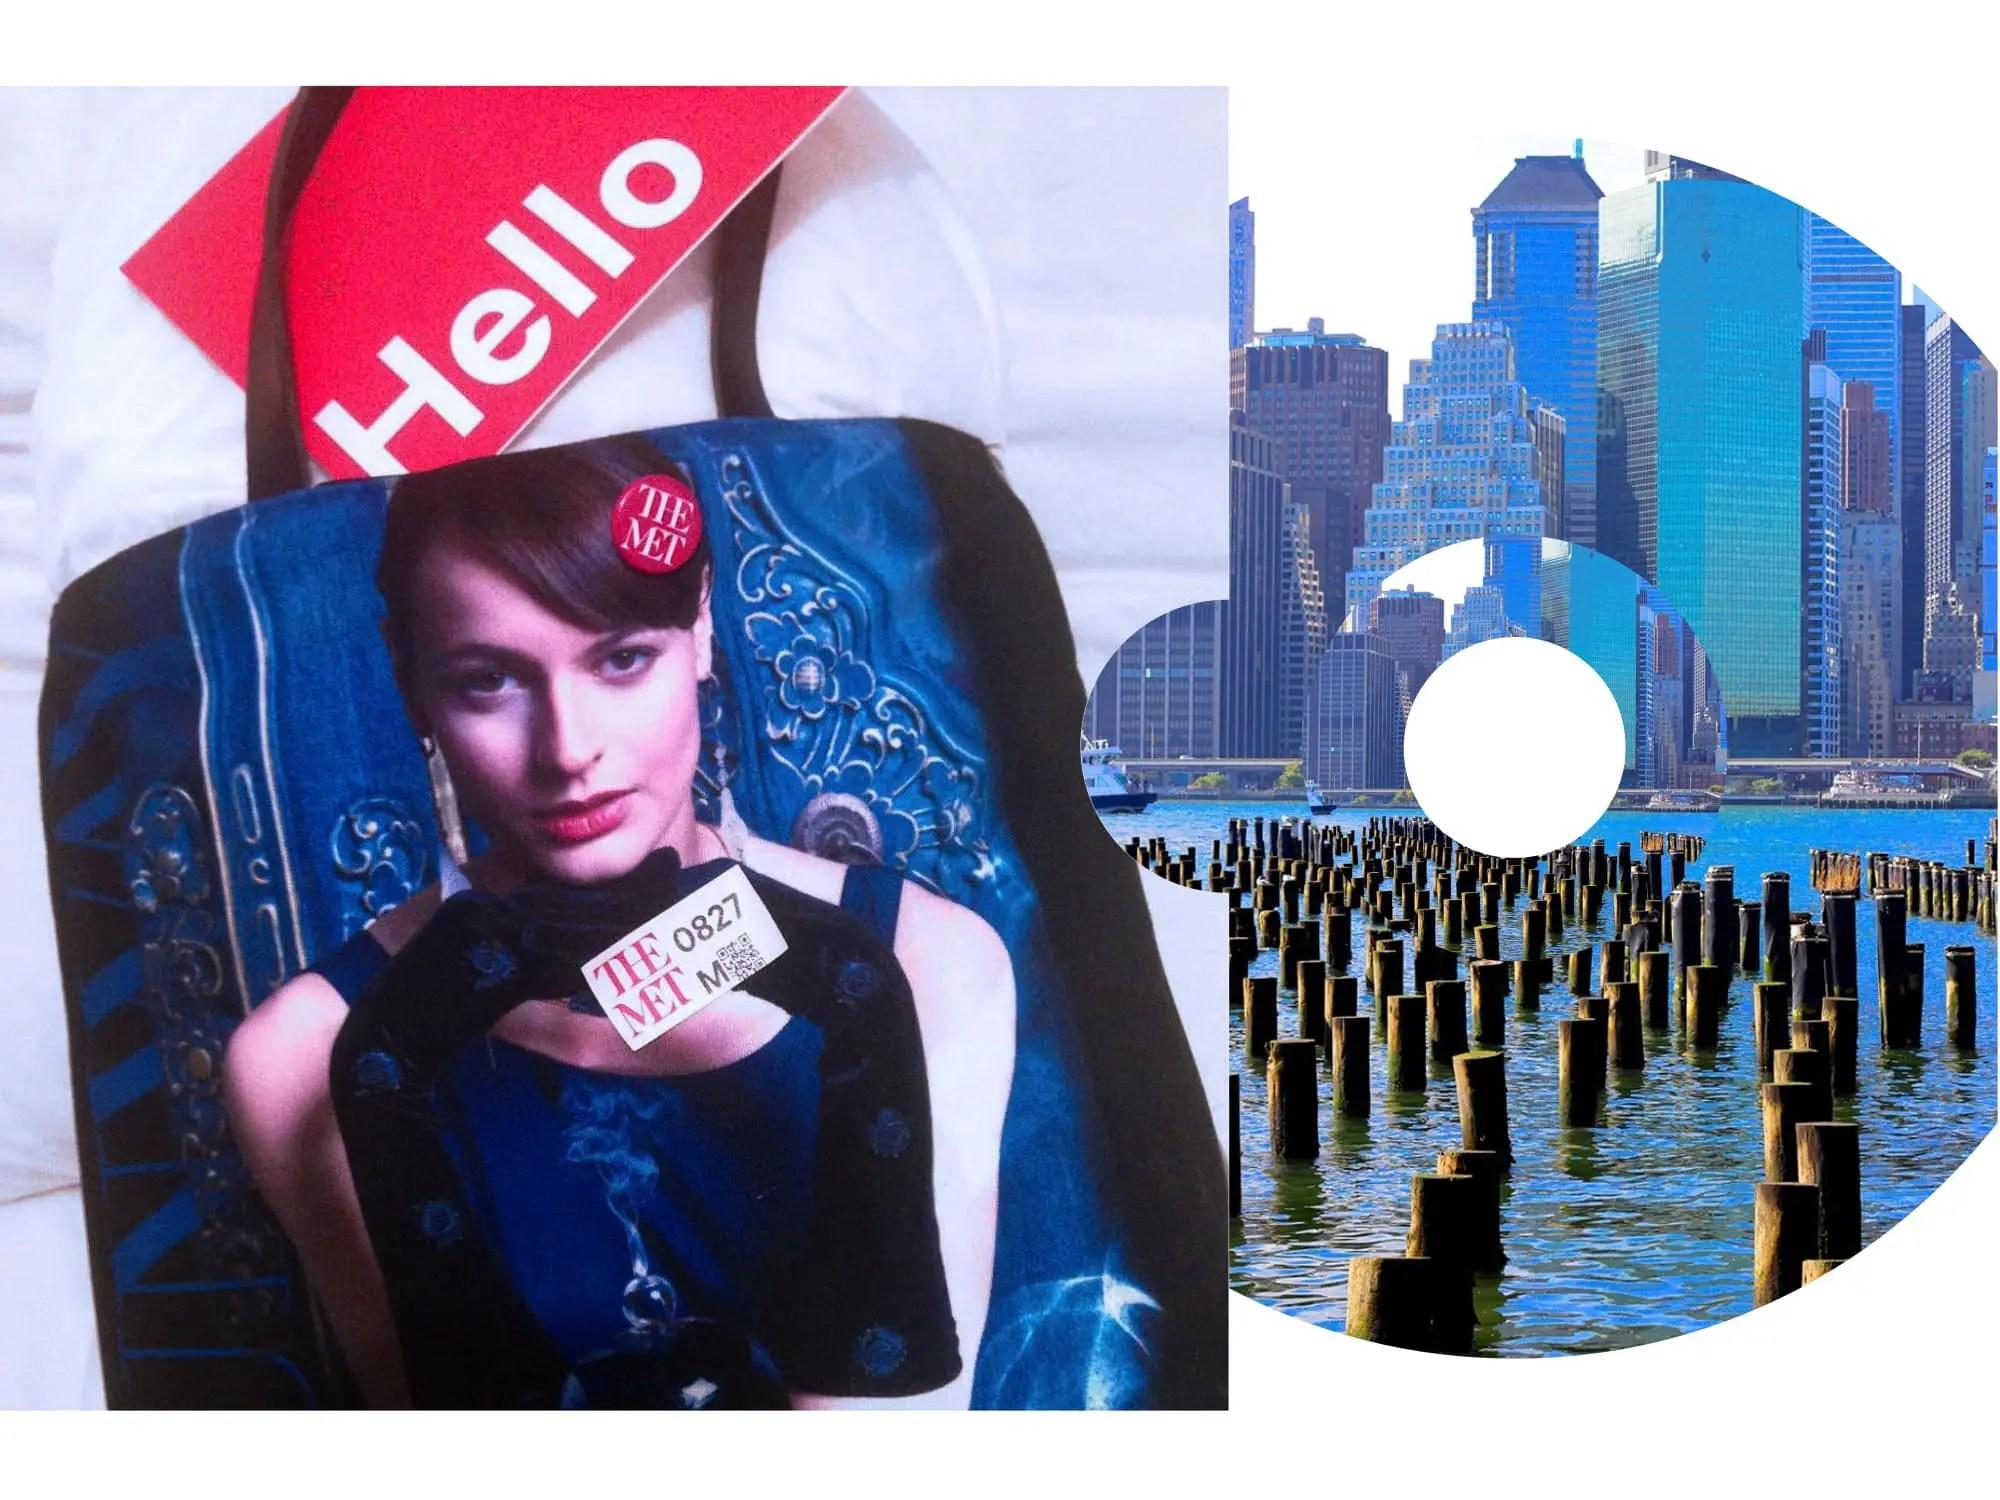 runway-look-official-runway-magazine-runway-tote-bag-eleonora-de-gray-paris-new-york-los-angeles-guillaumette-duplaix